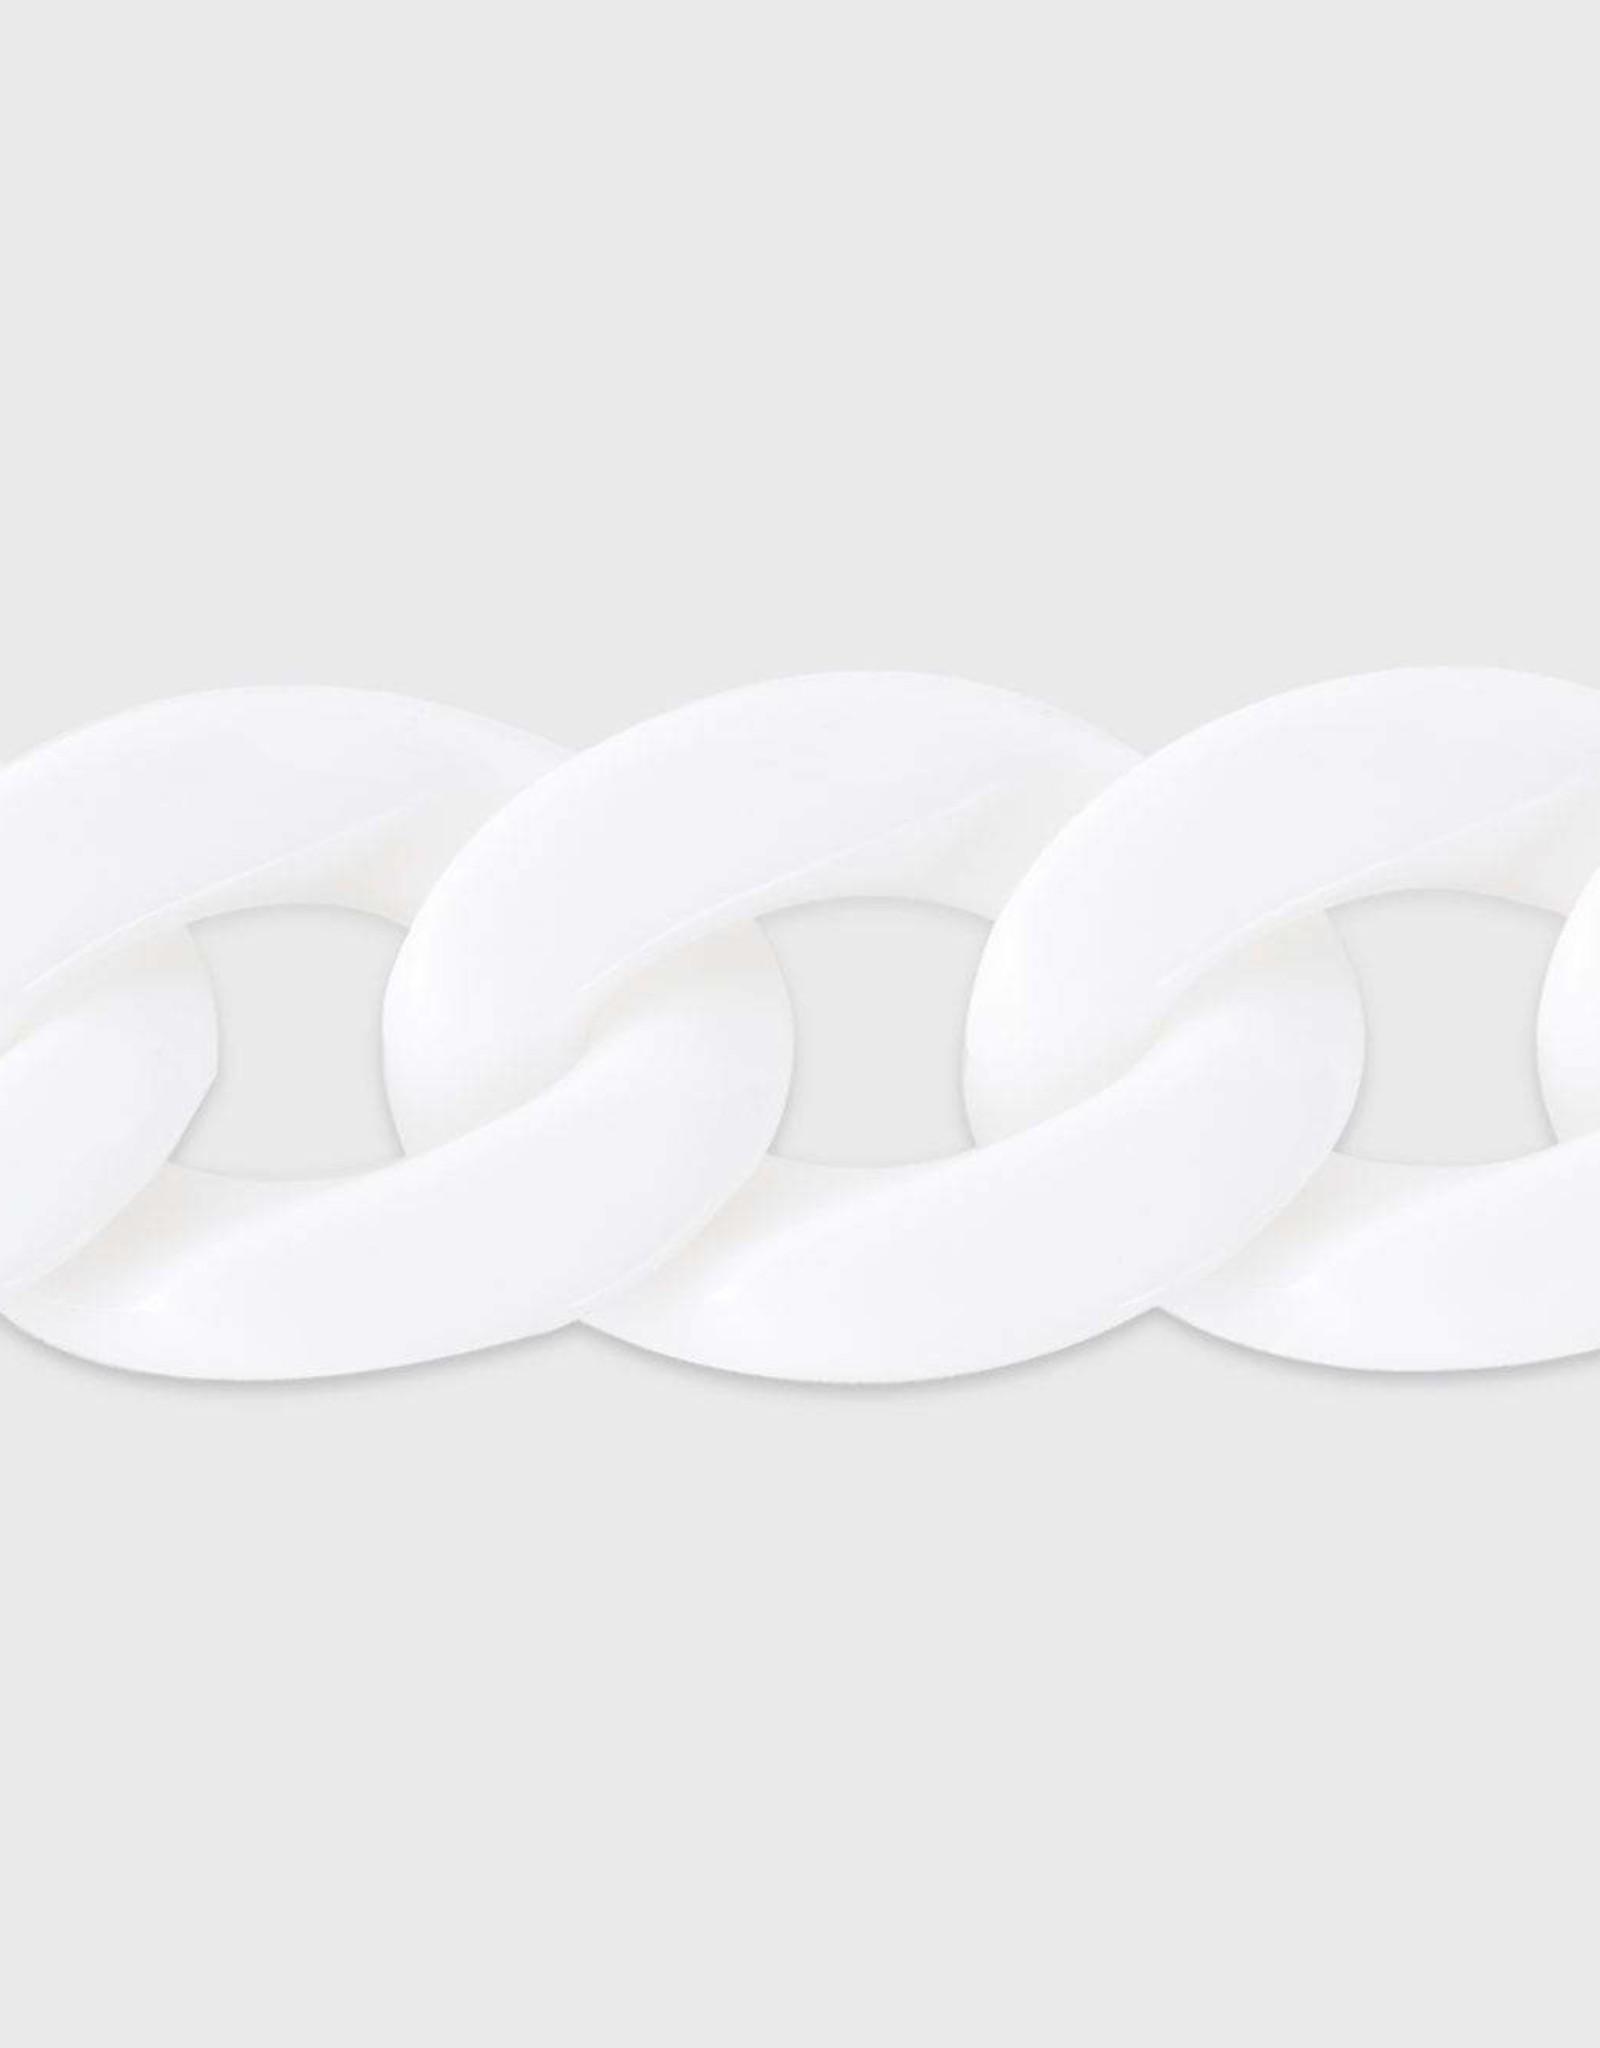 Komono Komono - Zonnebril-ketting - Brooks white